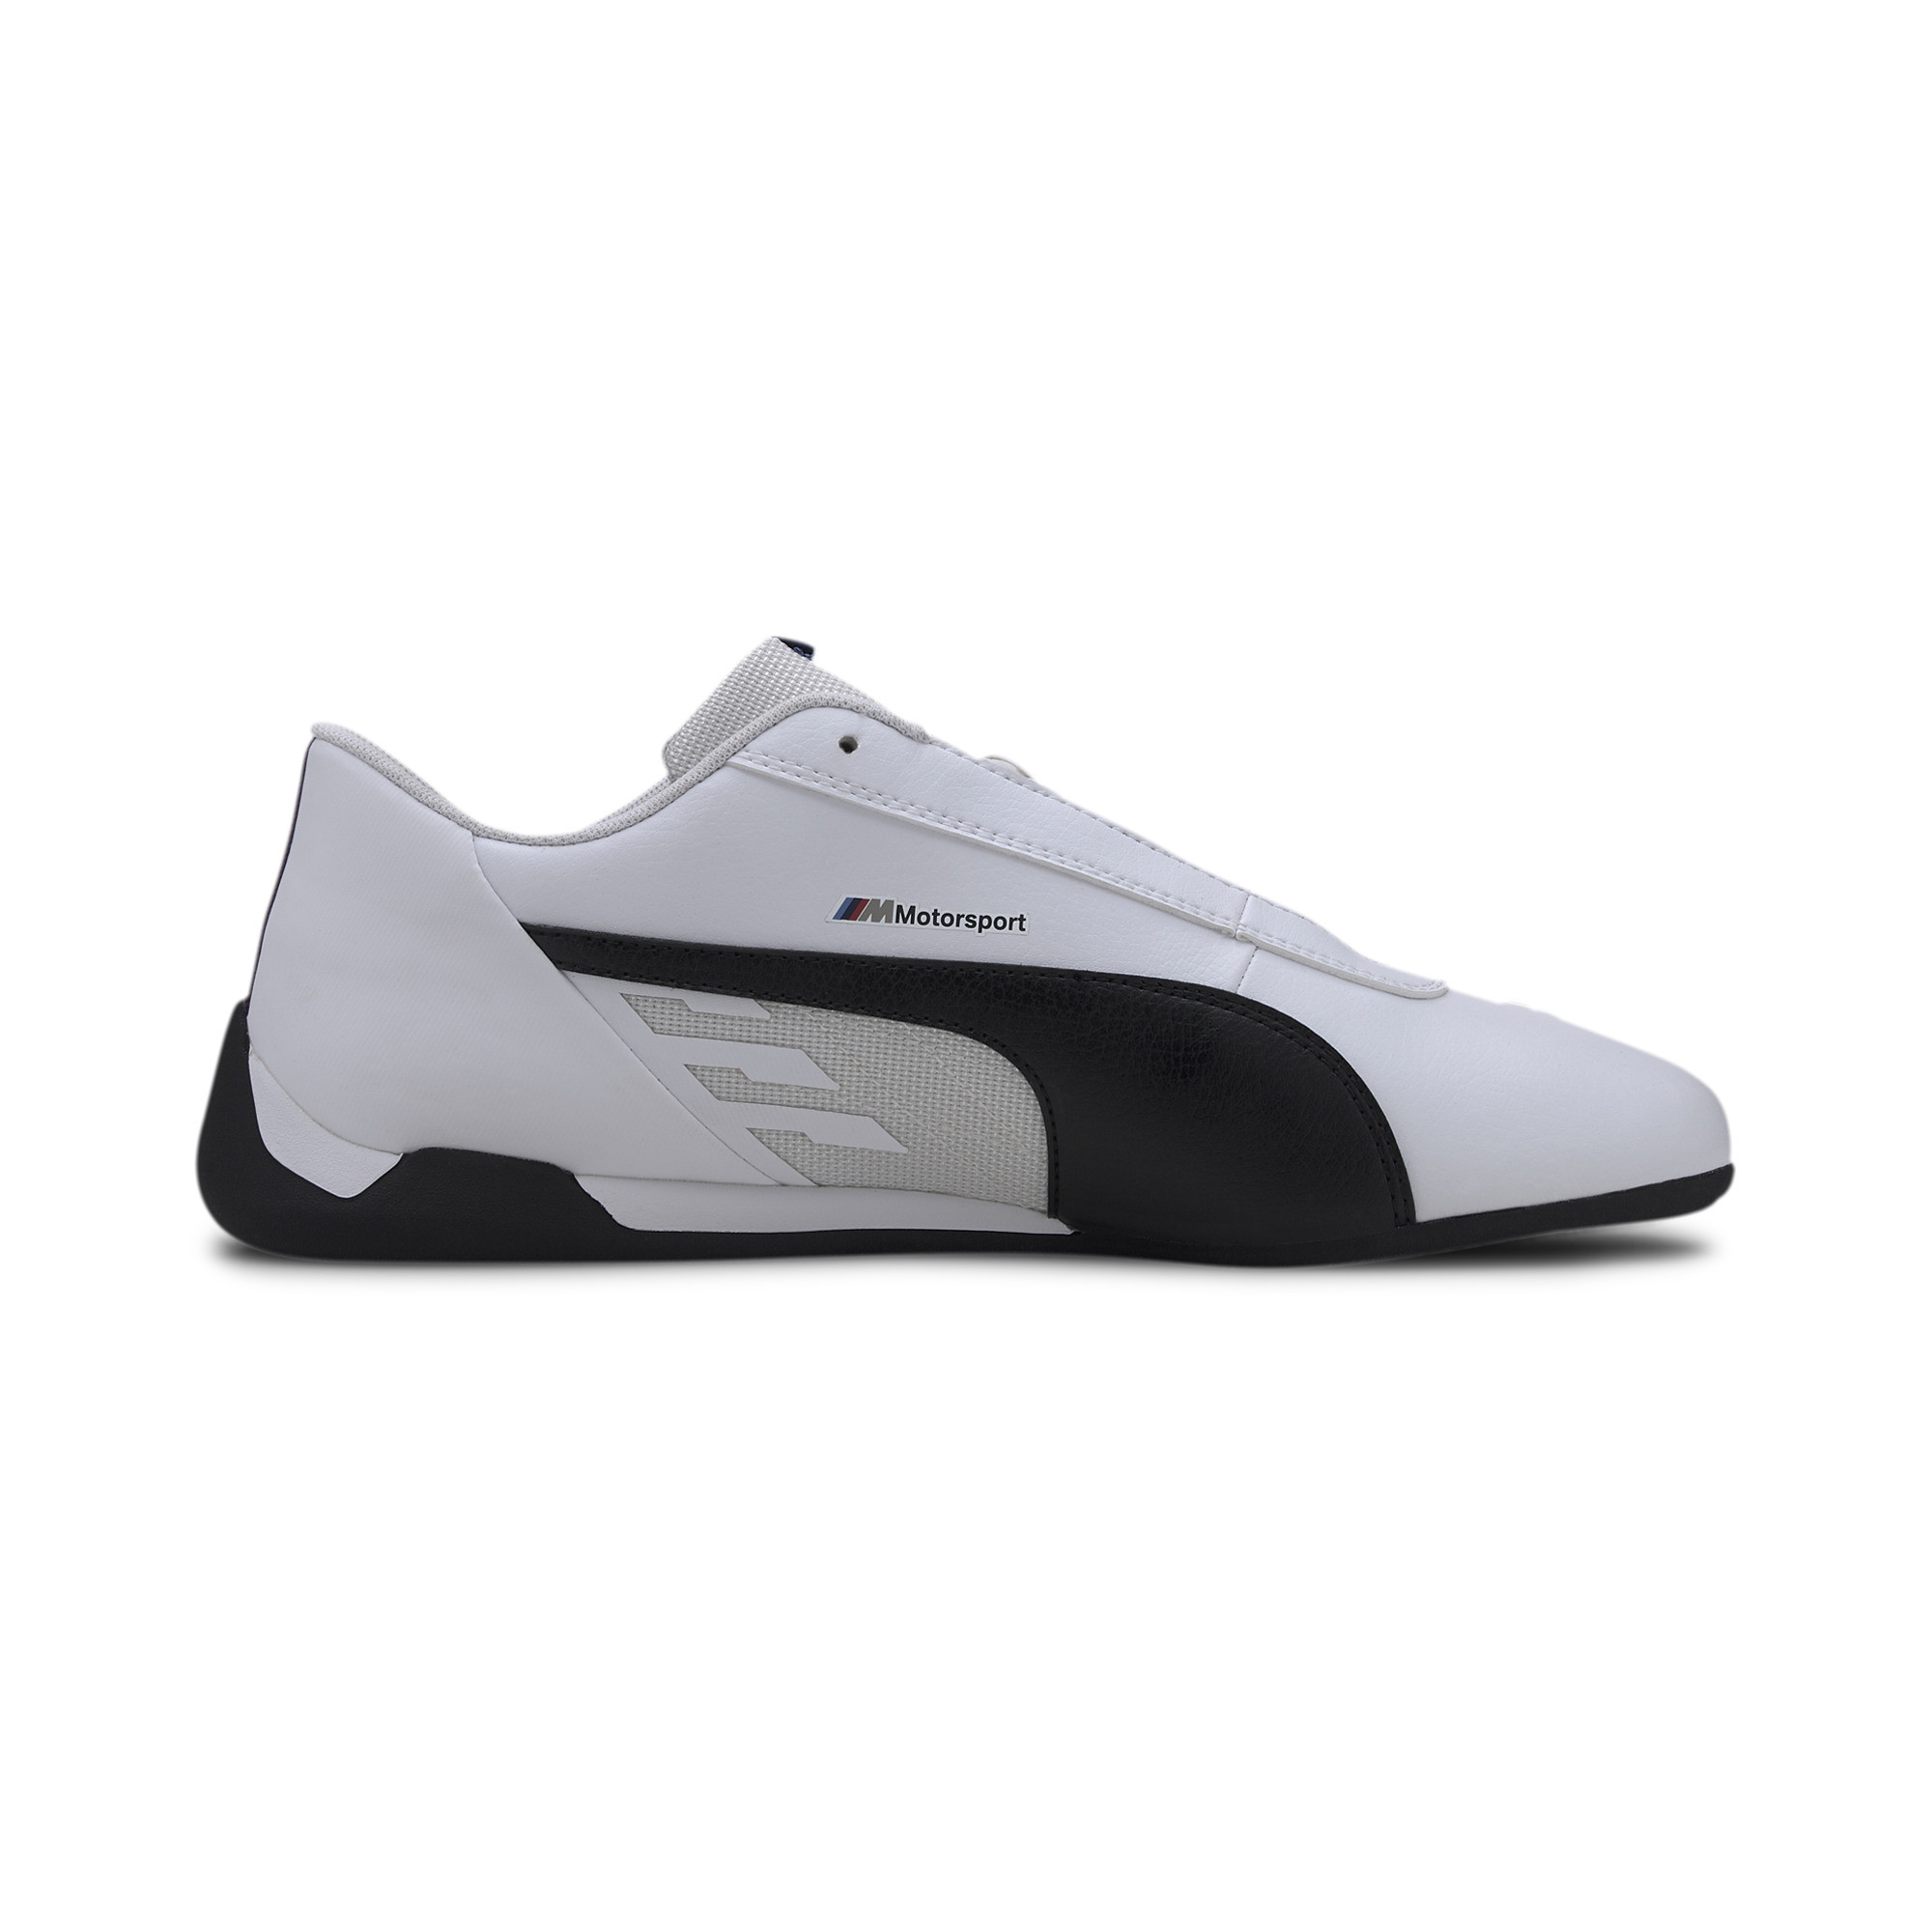 PUMA-Men-039-s-BMW-M-Motorsport-R-Cat-Motorsport-Shoes thumbnail 7